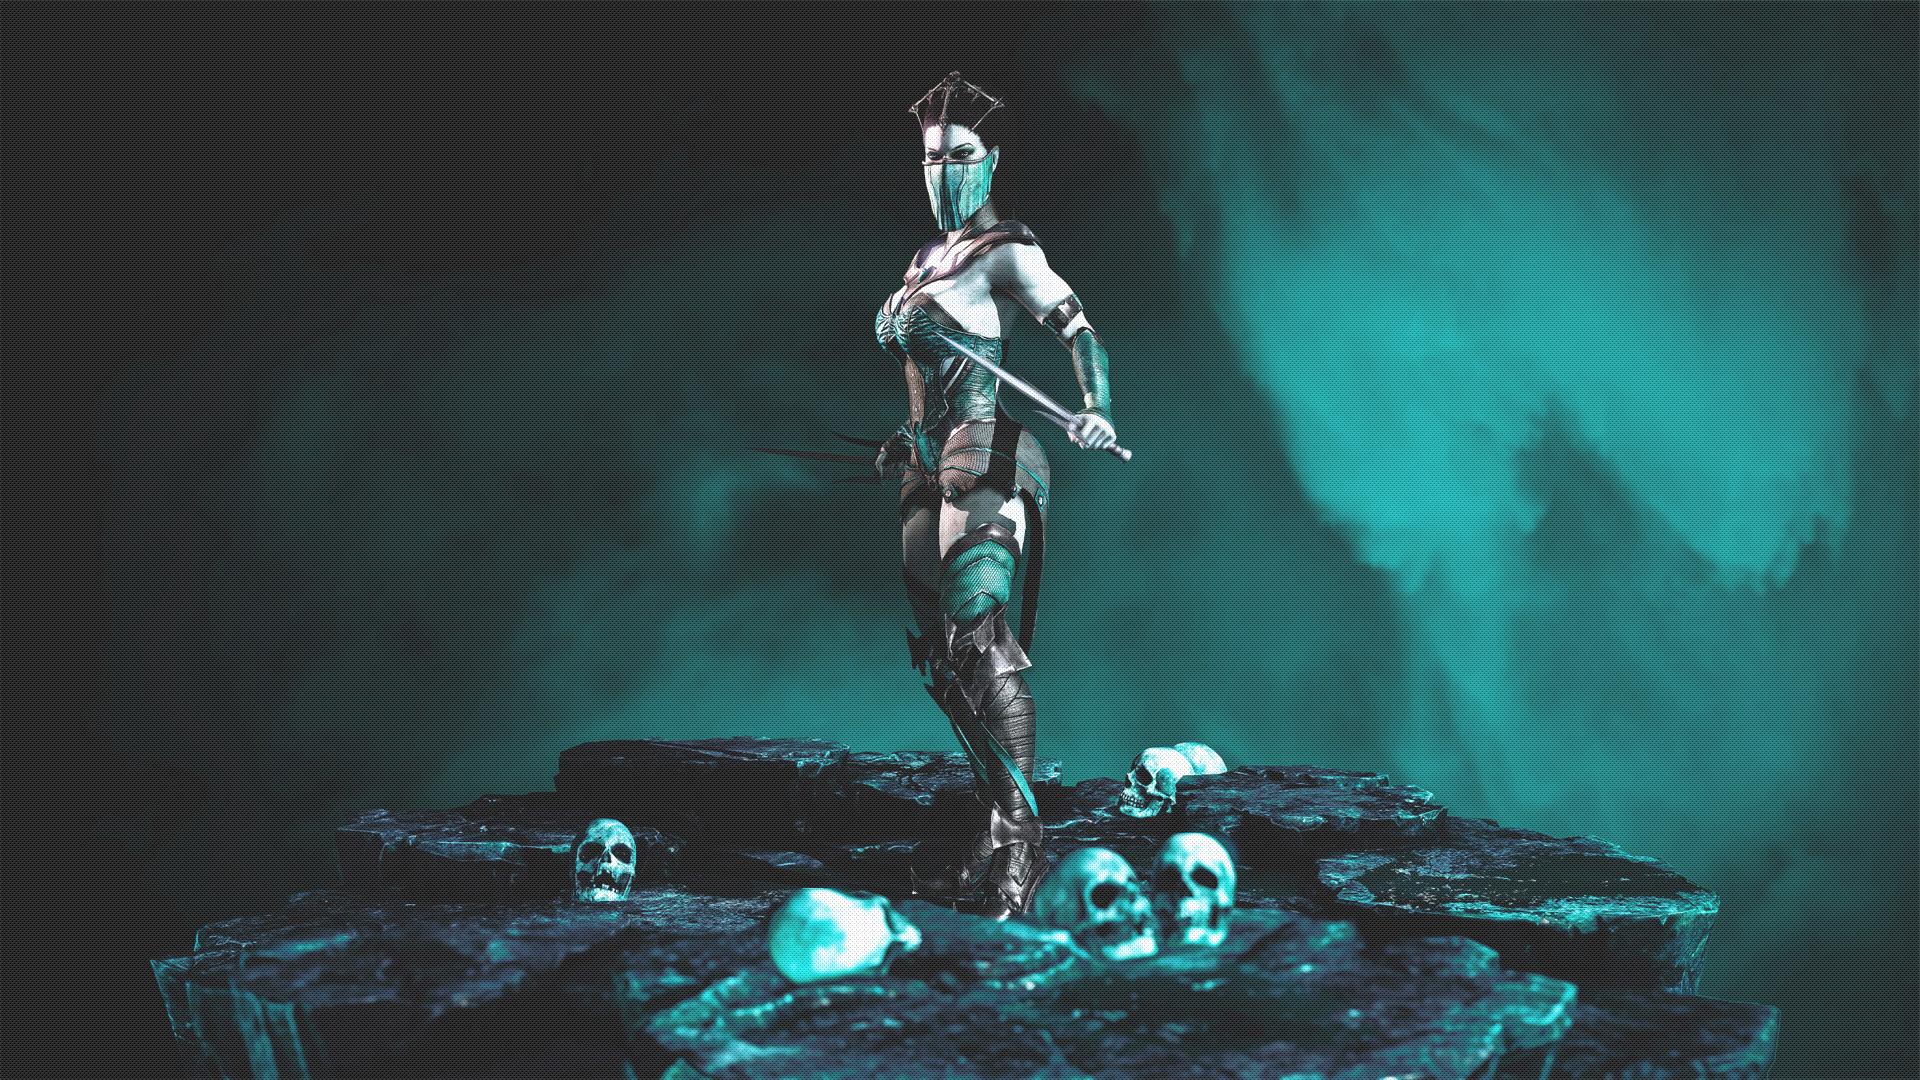 … MILEENA – Vampiress [WALLPAPER] by disturbedkorea